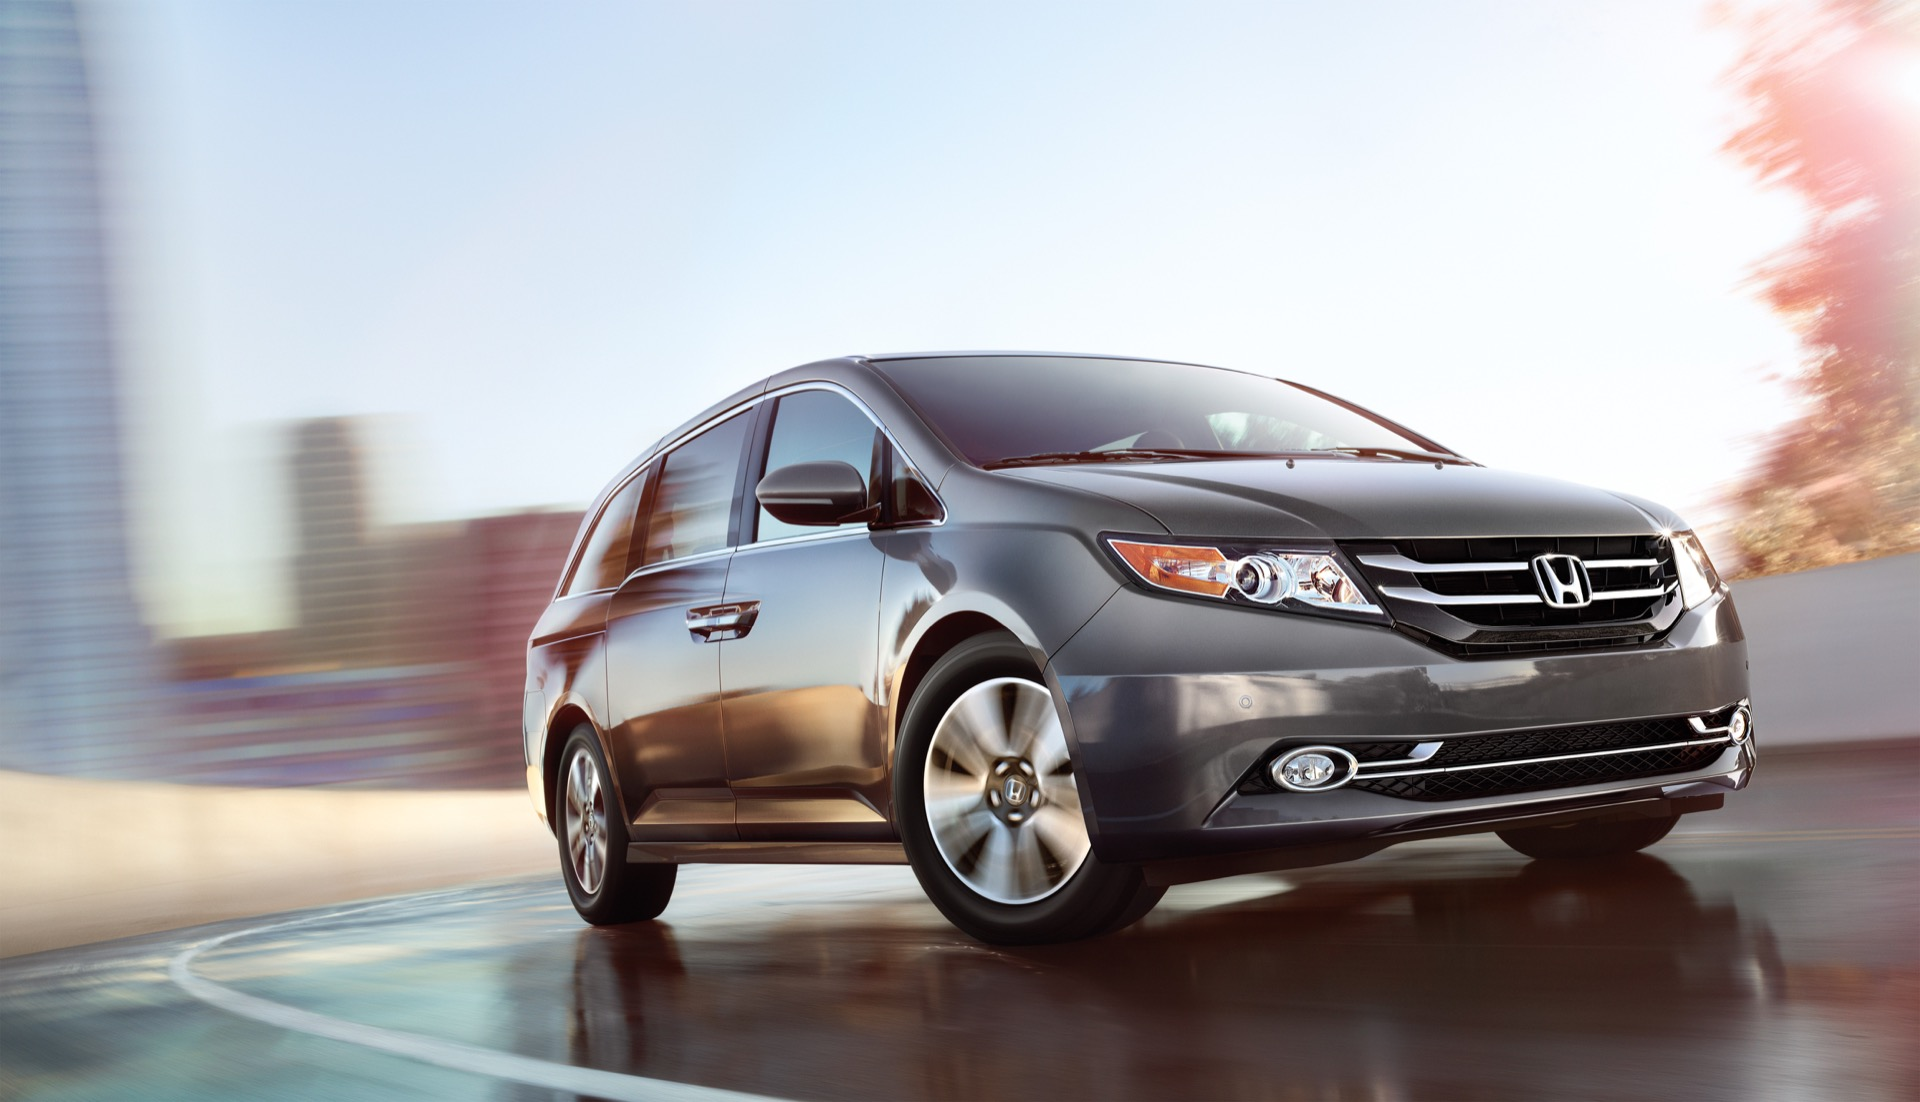 2011 2016 Honda Odyssey minivans recalled 641 000 vehicles affected